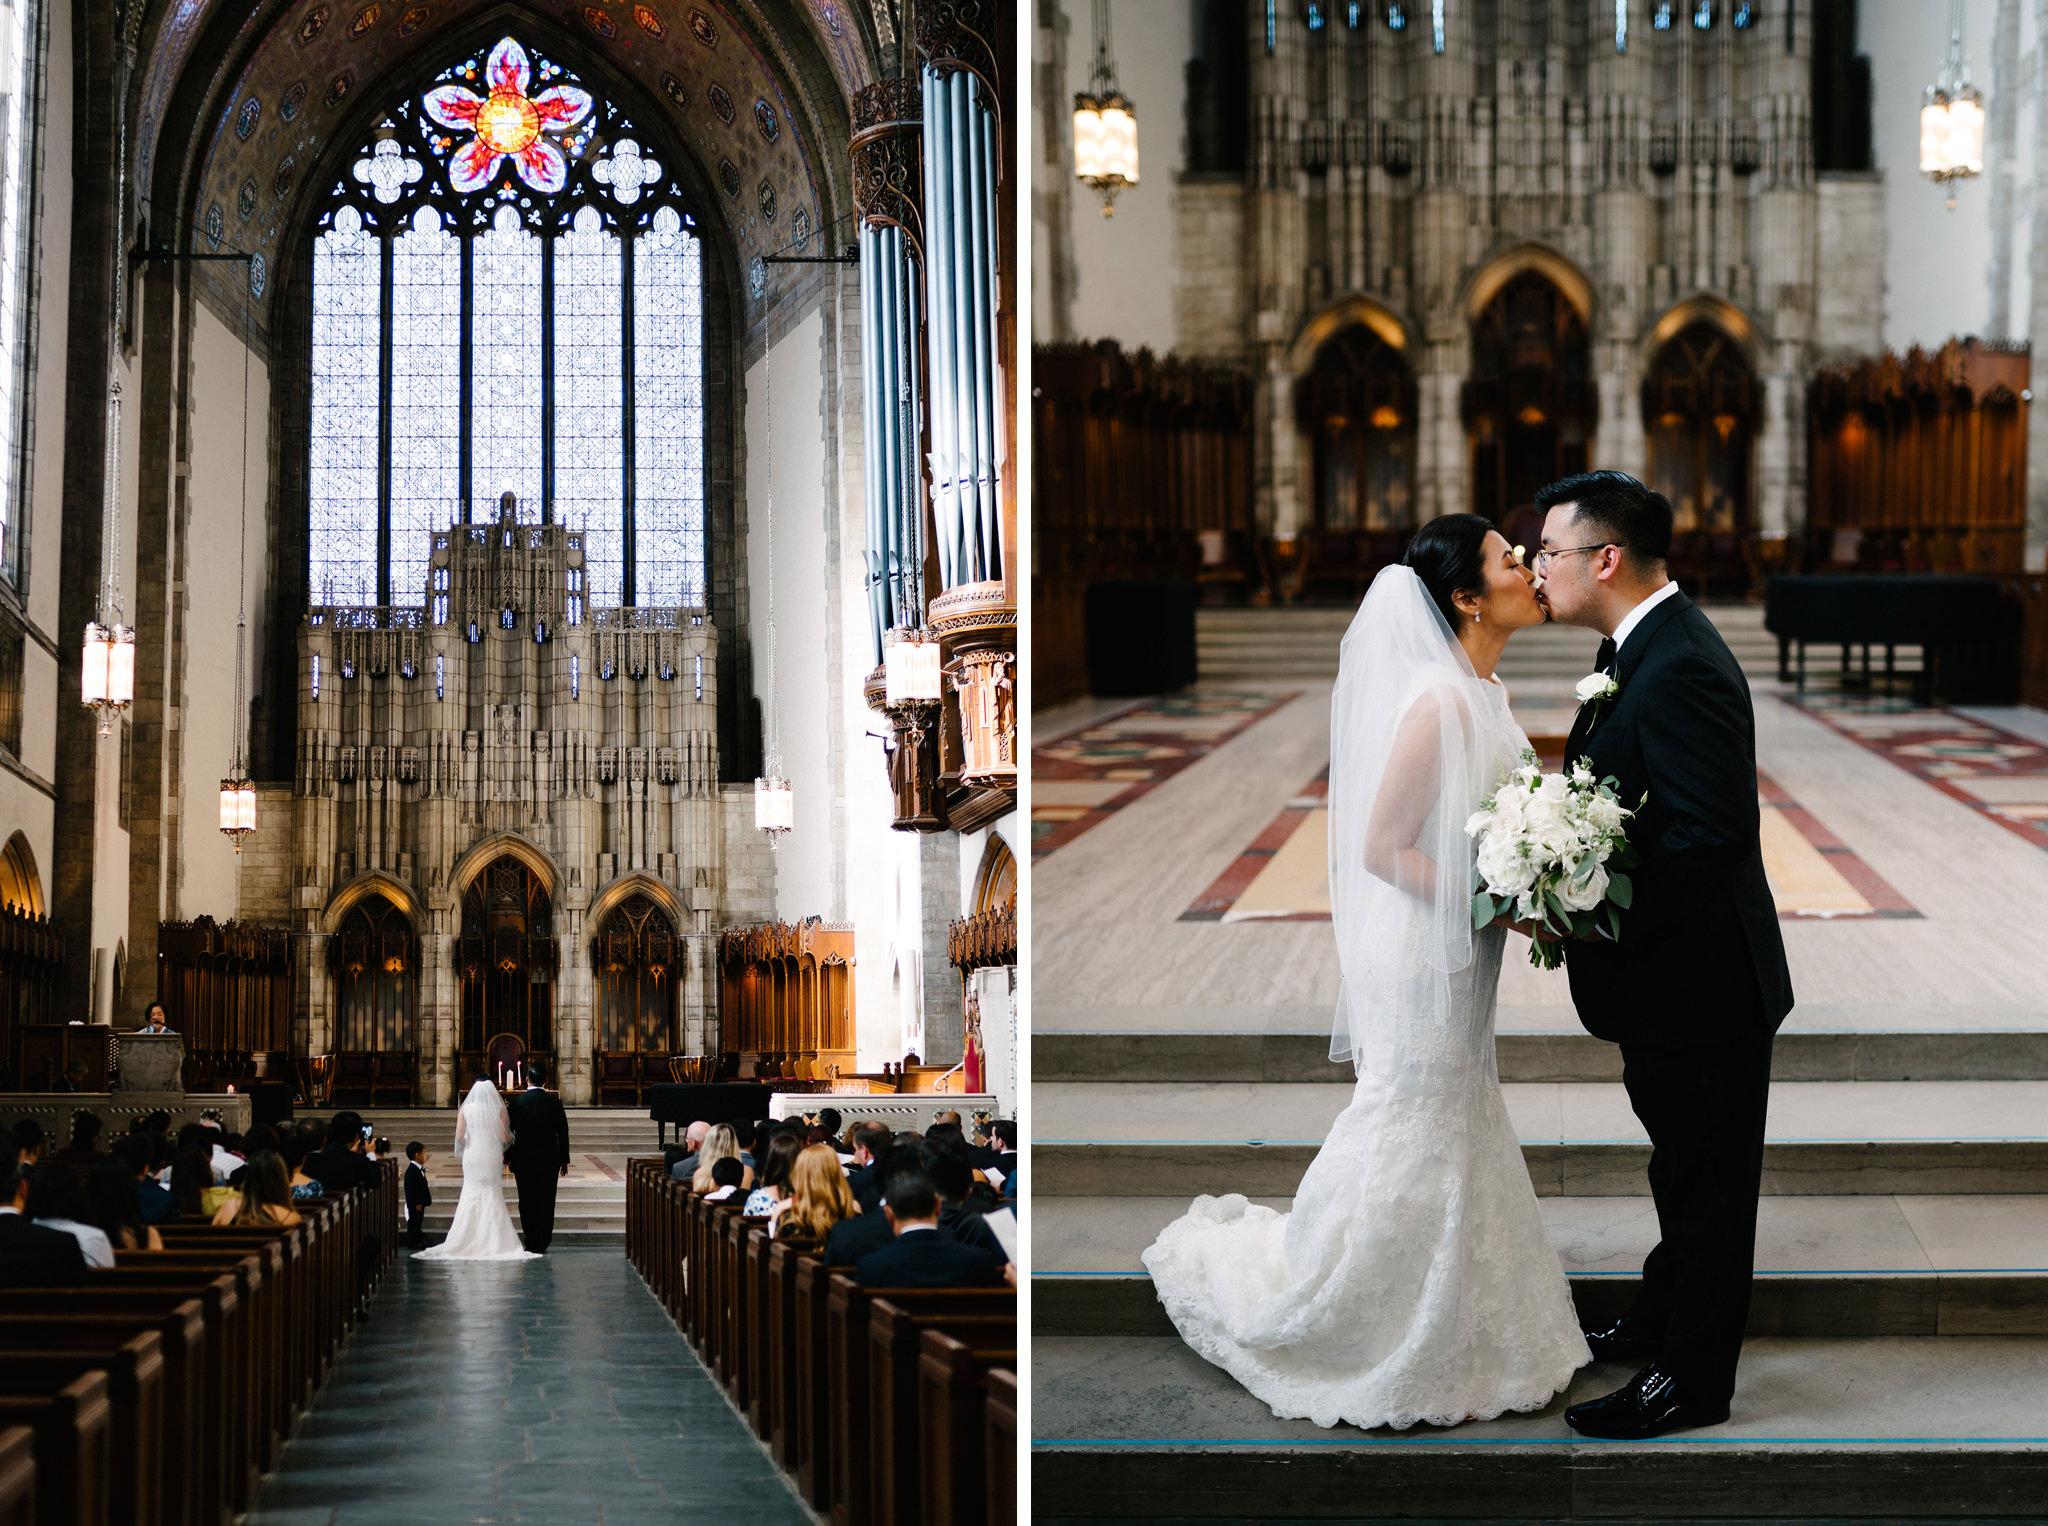 027-rempel-photography-chicago-wedding-inspiration-sara-philip-rockefeller-chapel-trump-tower.jpg